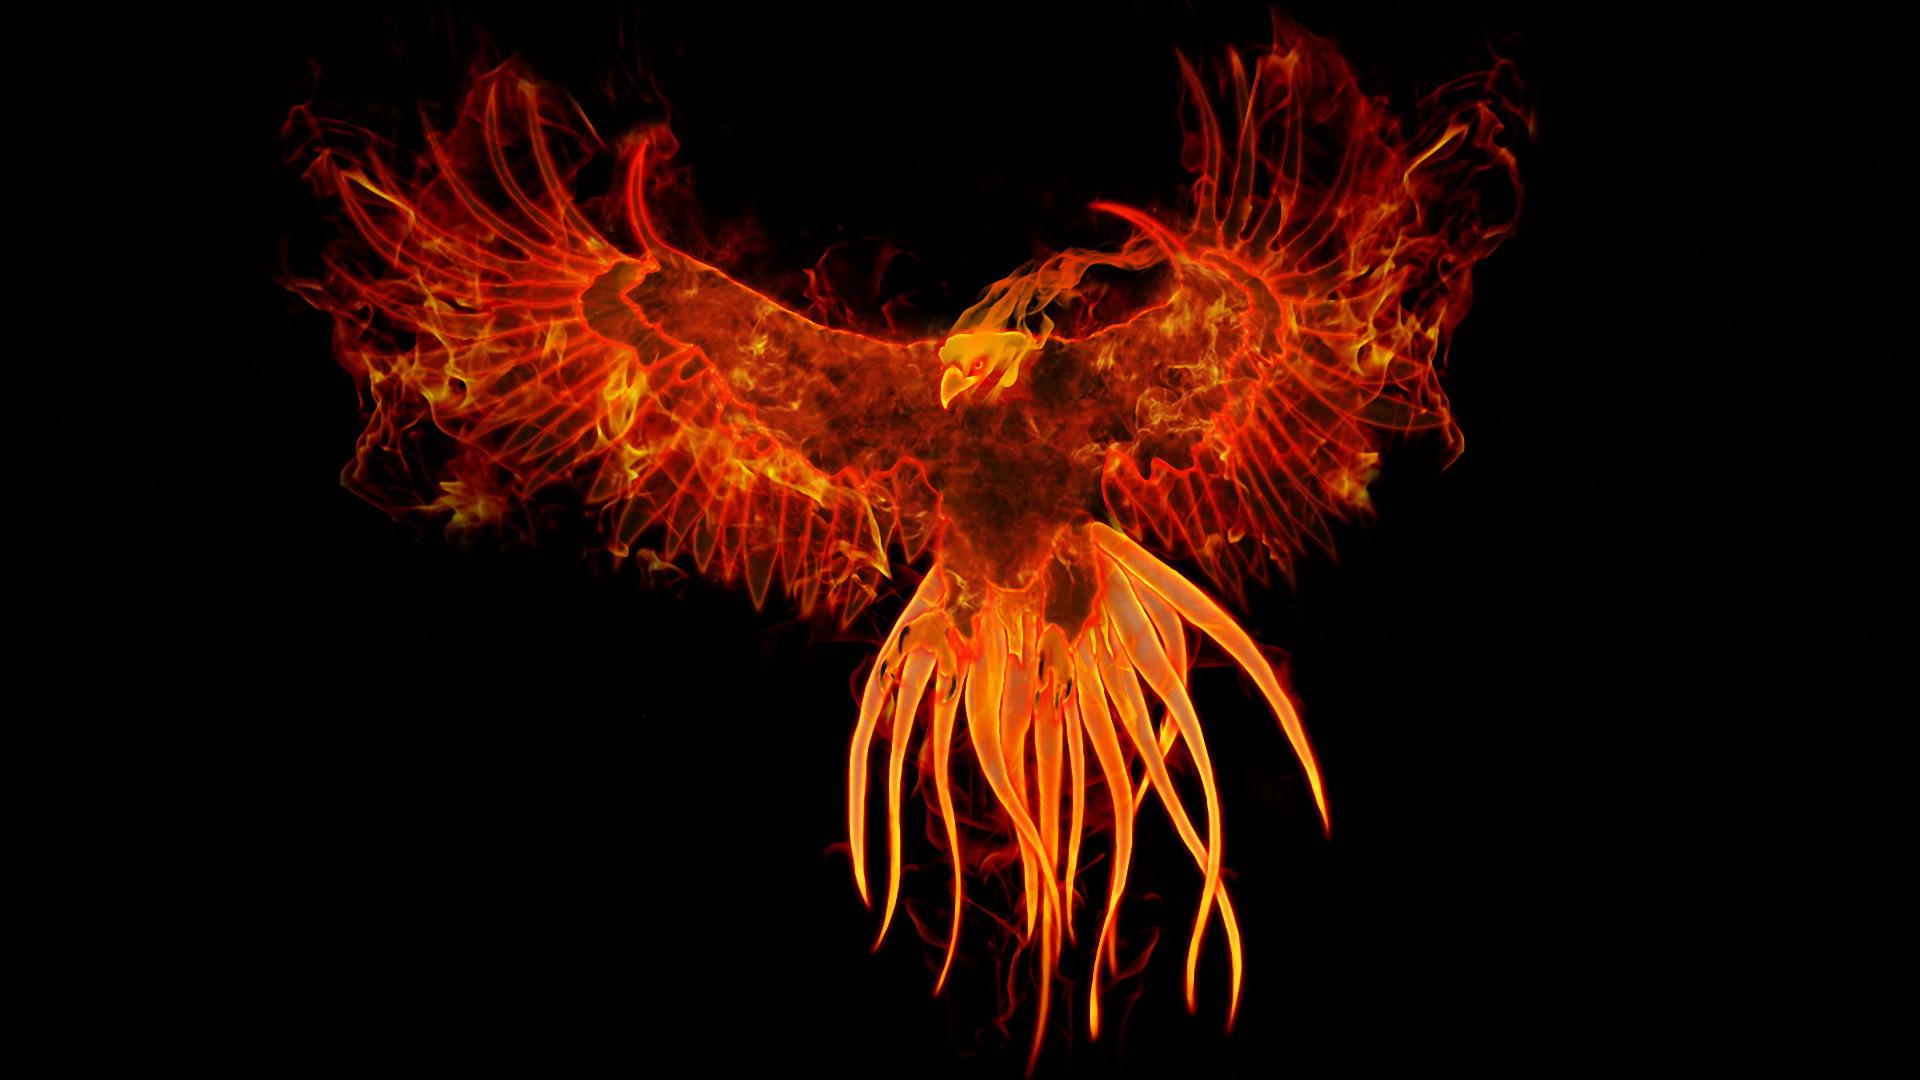 phoenix wallpaper hd - photo #6